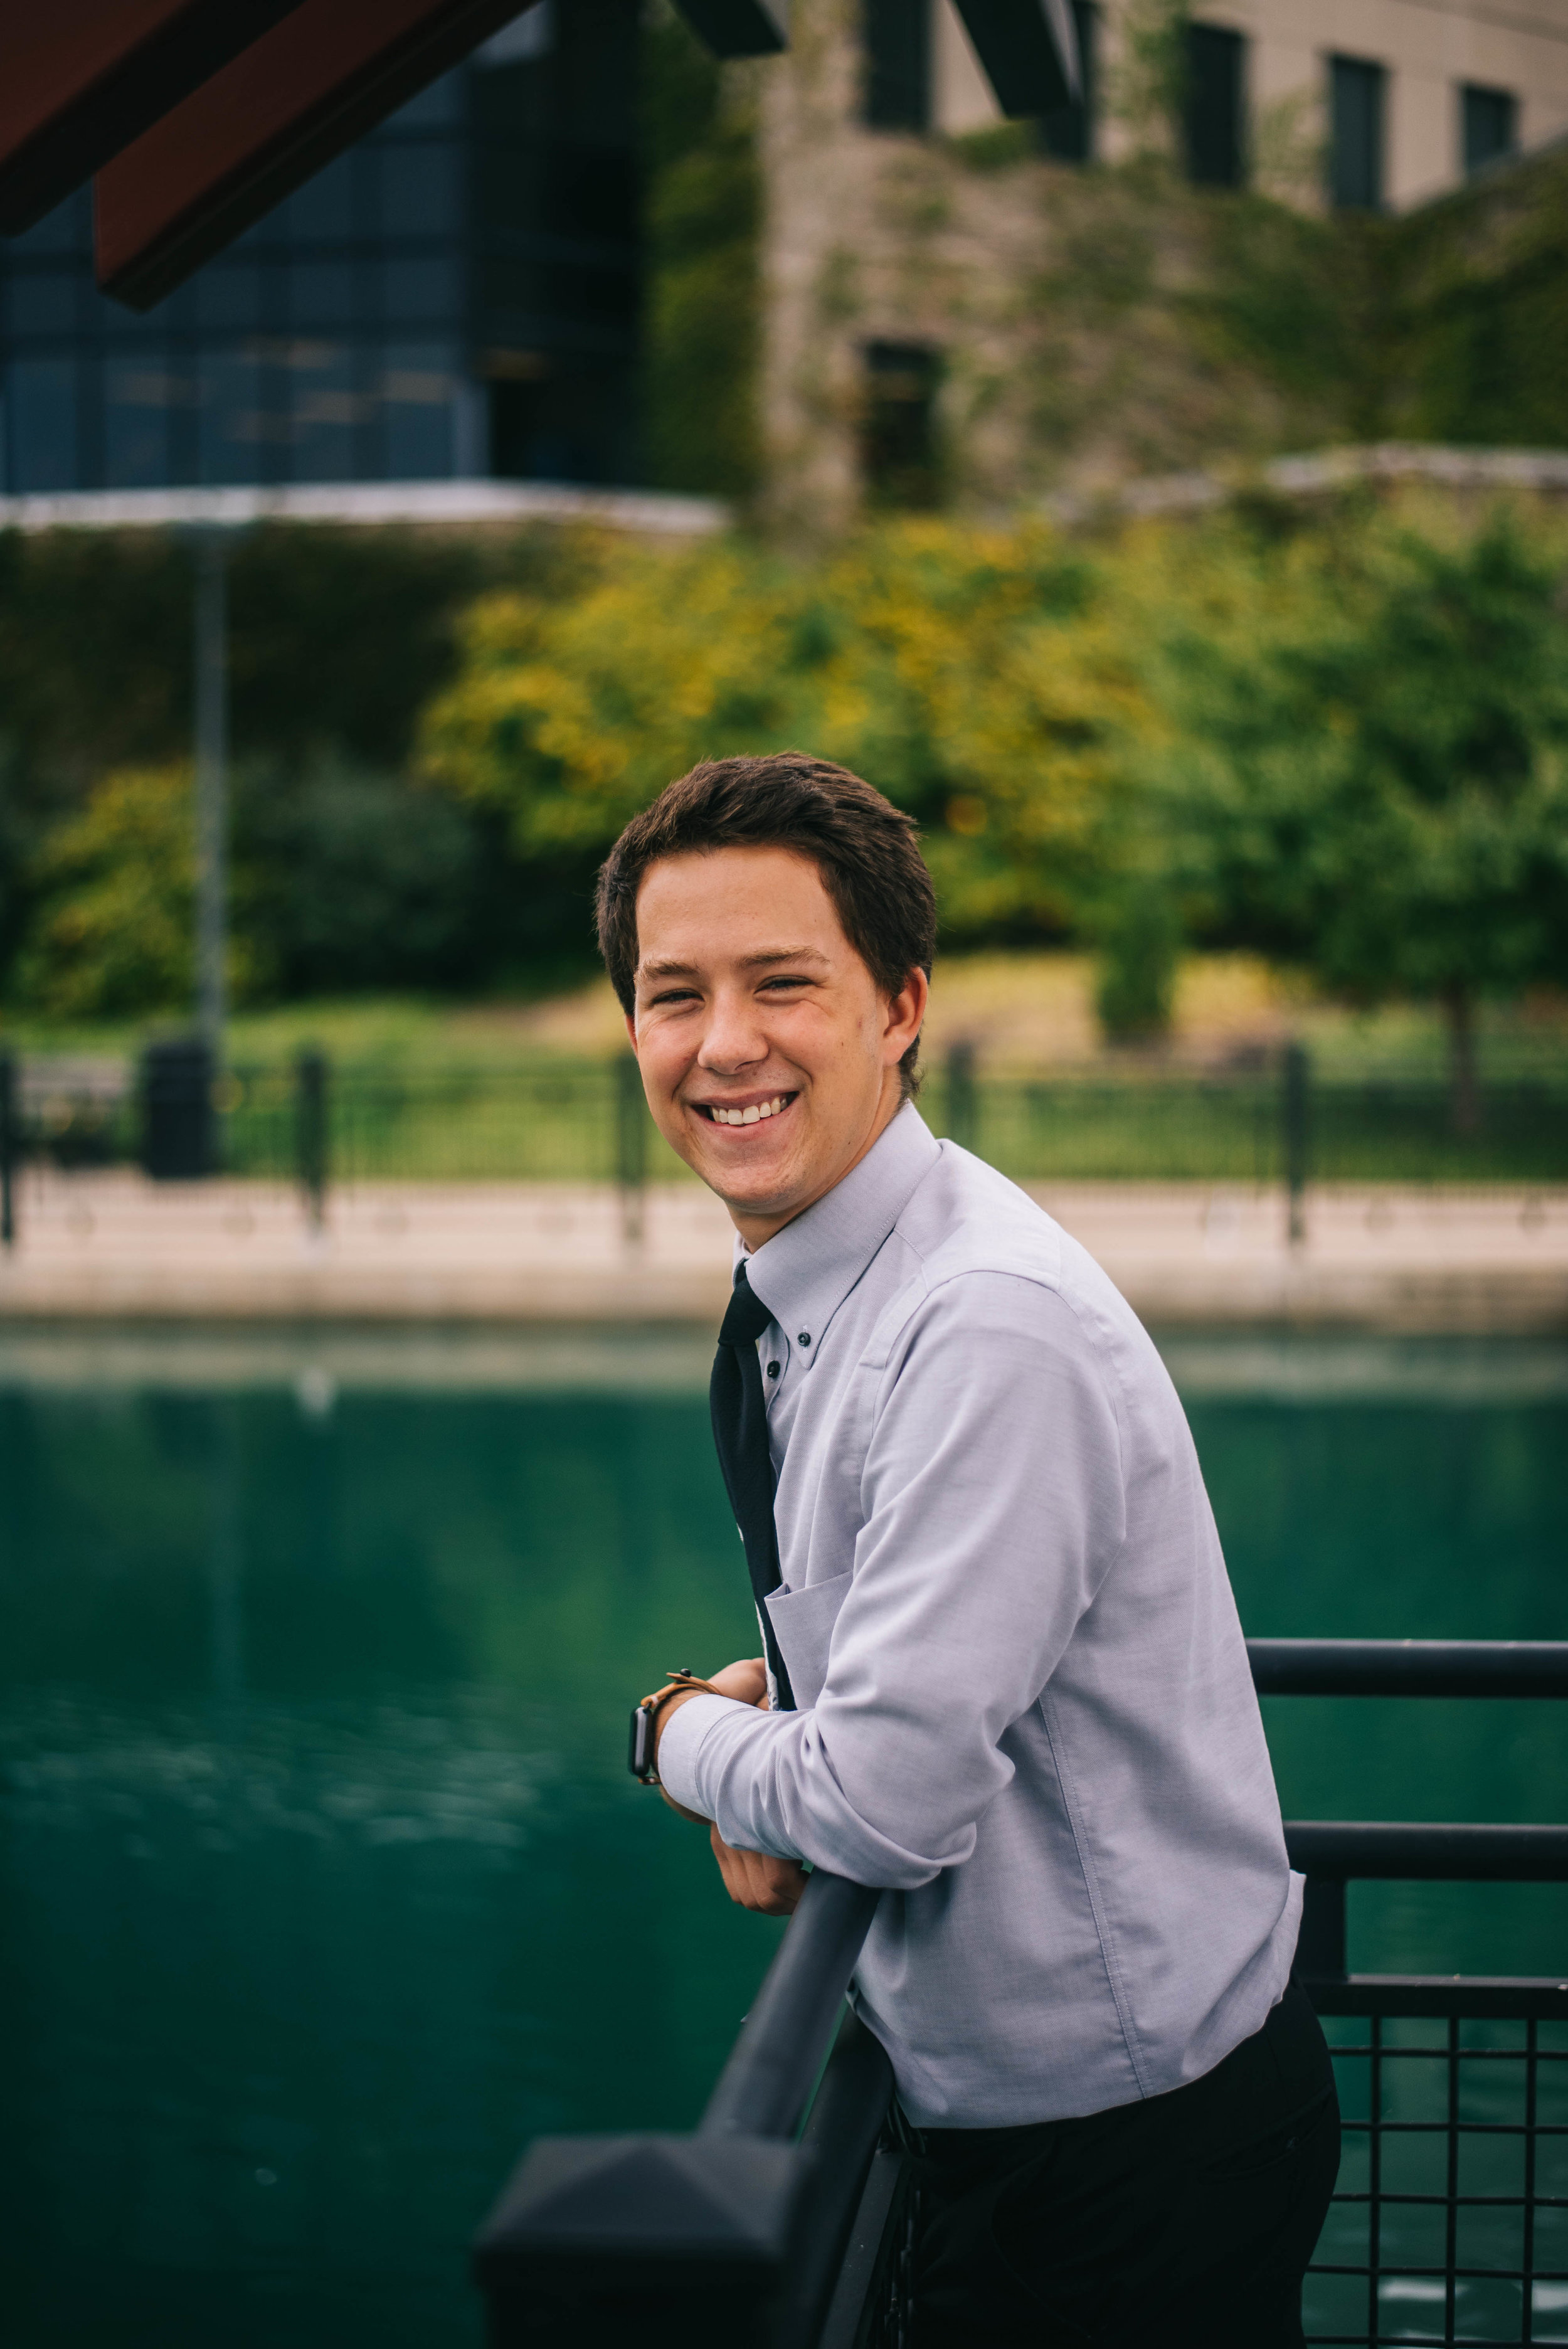 Reid Wassmer     Composer, Musician, Web Designer